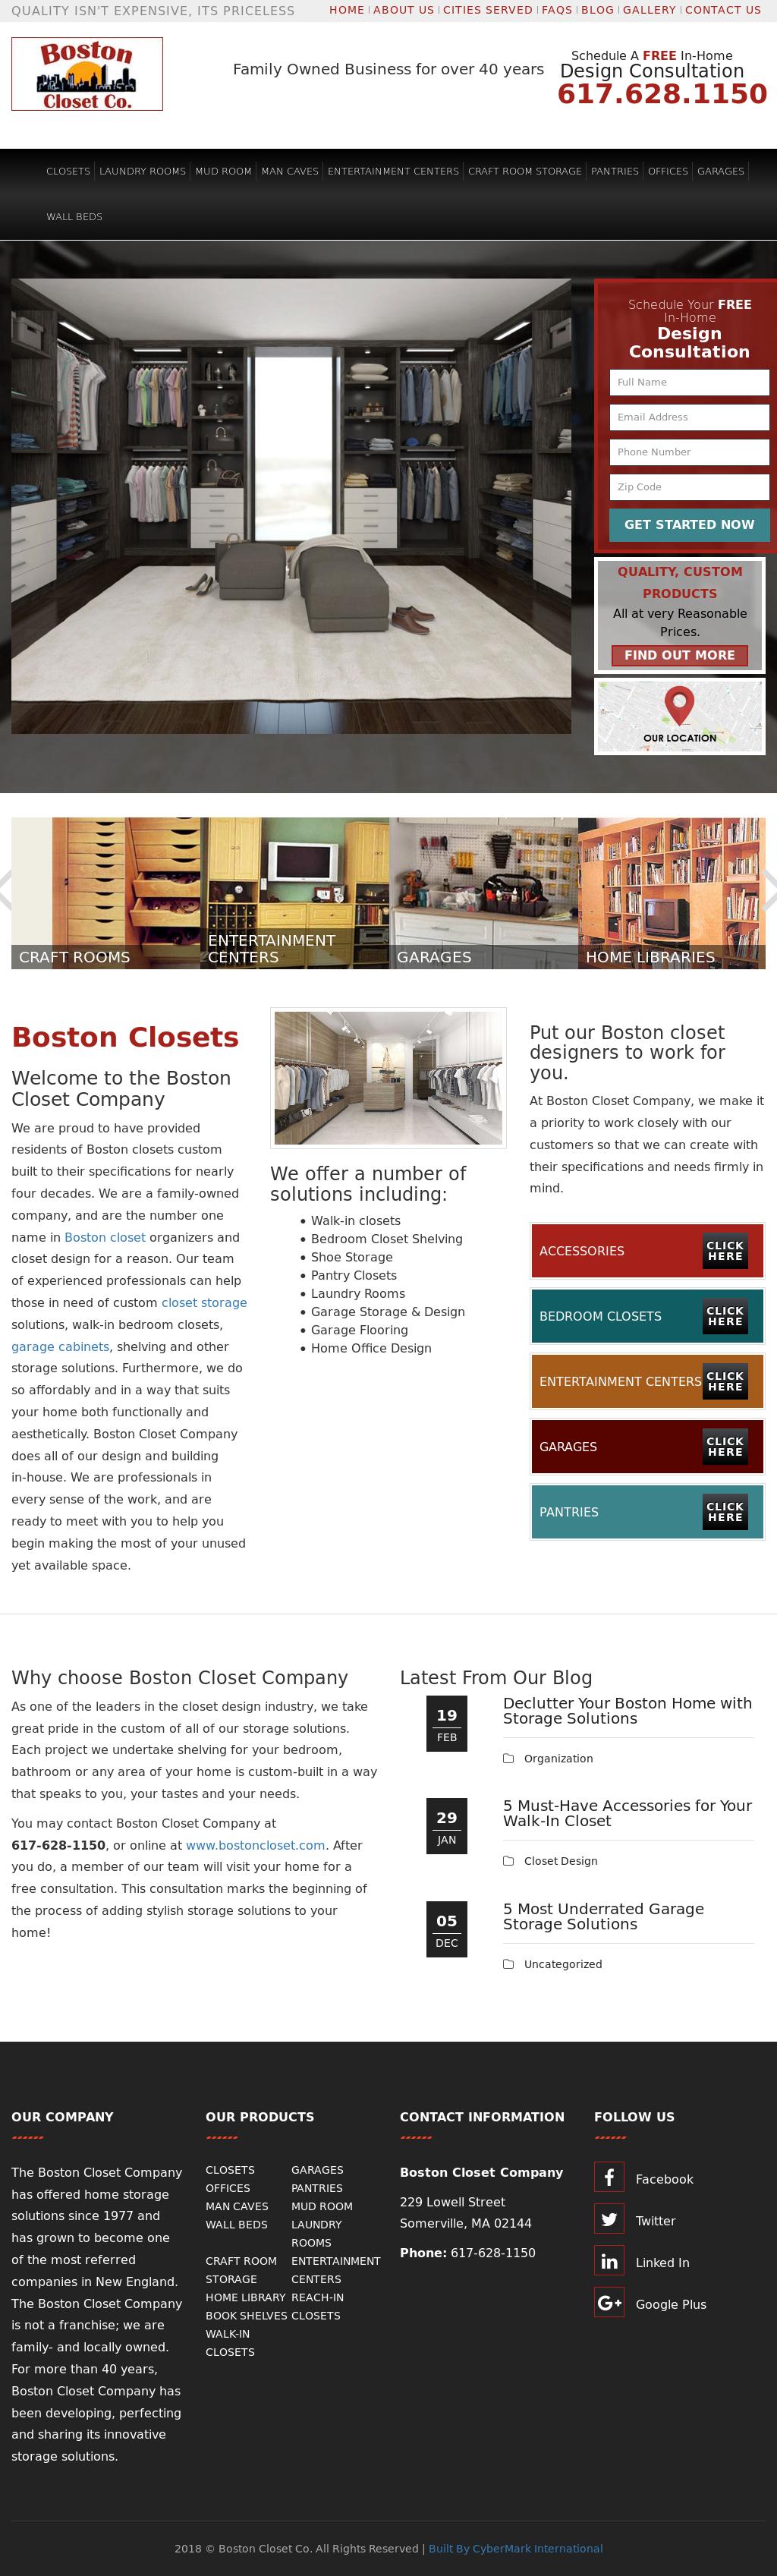 Boston Closetu0027s Website Screenshot On Mar 2018